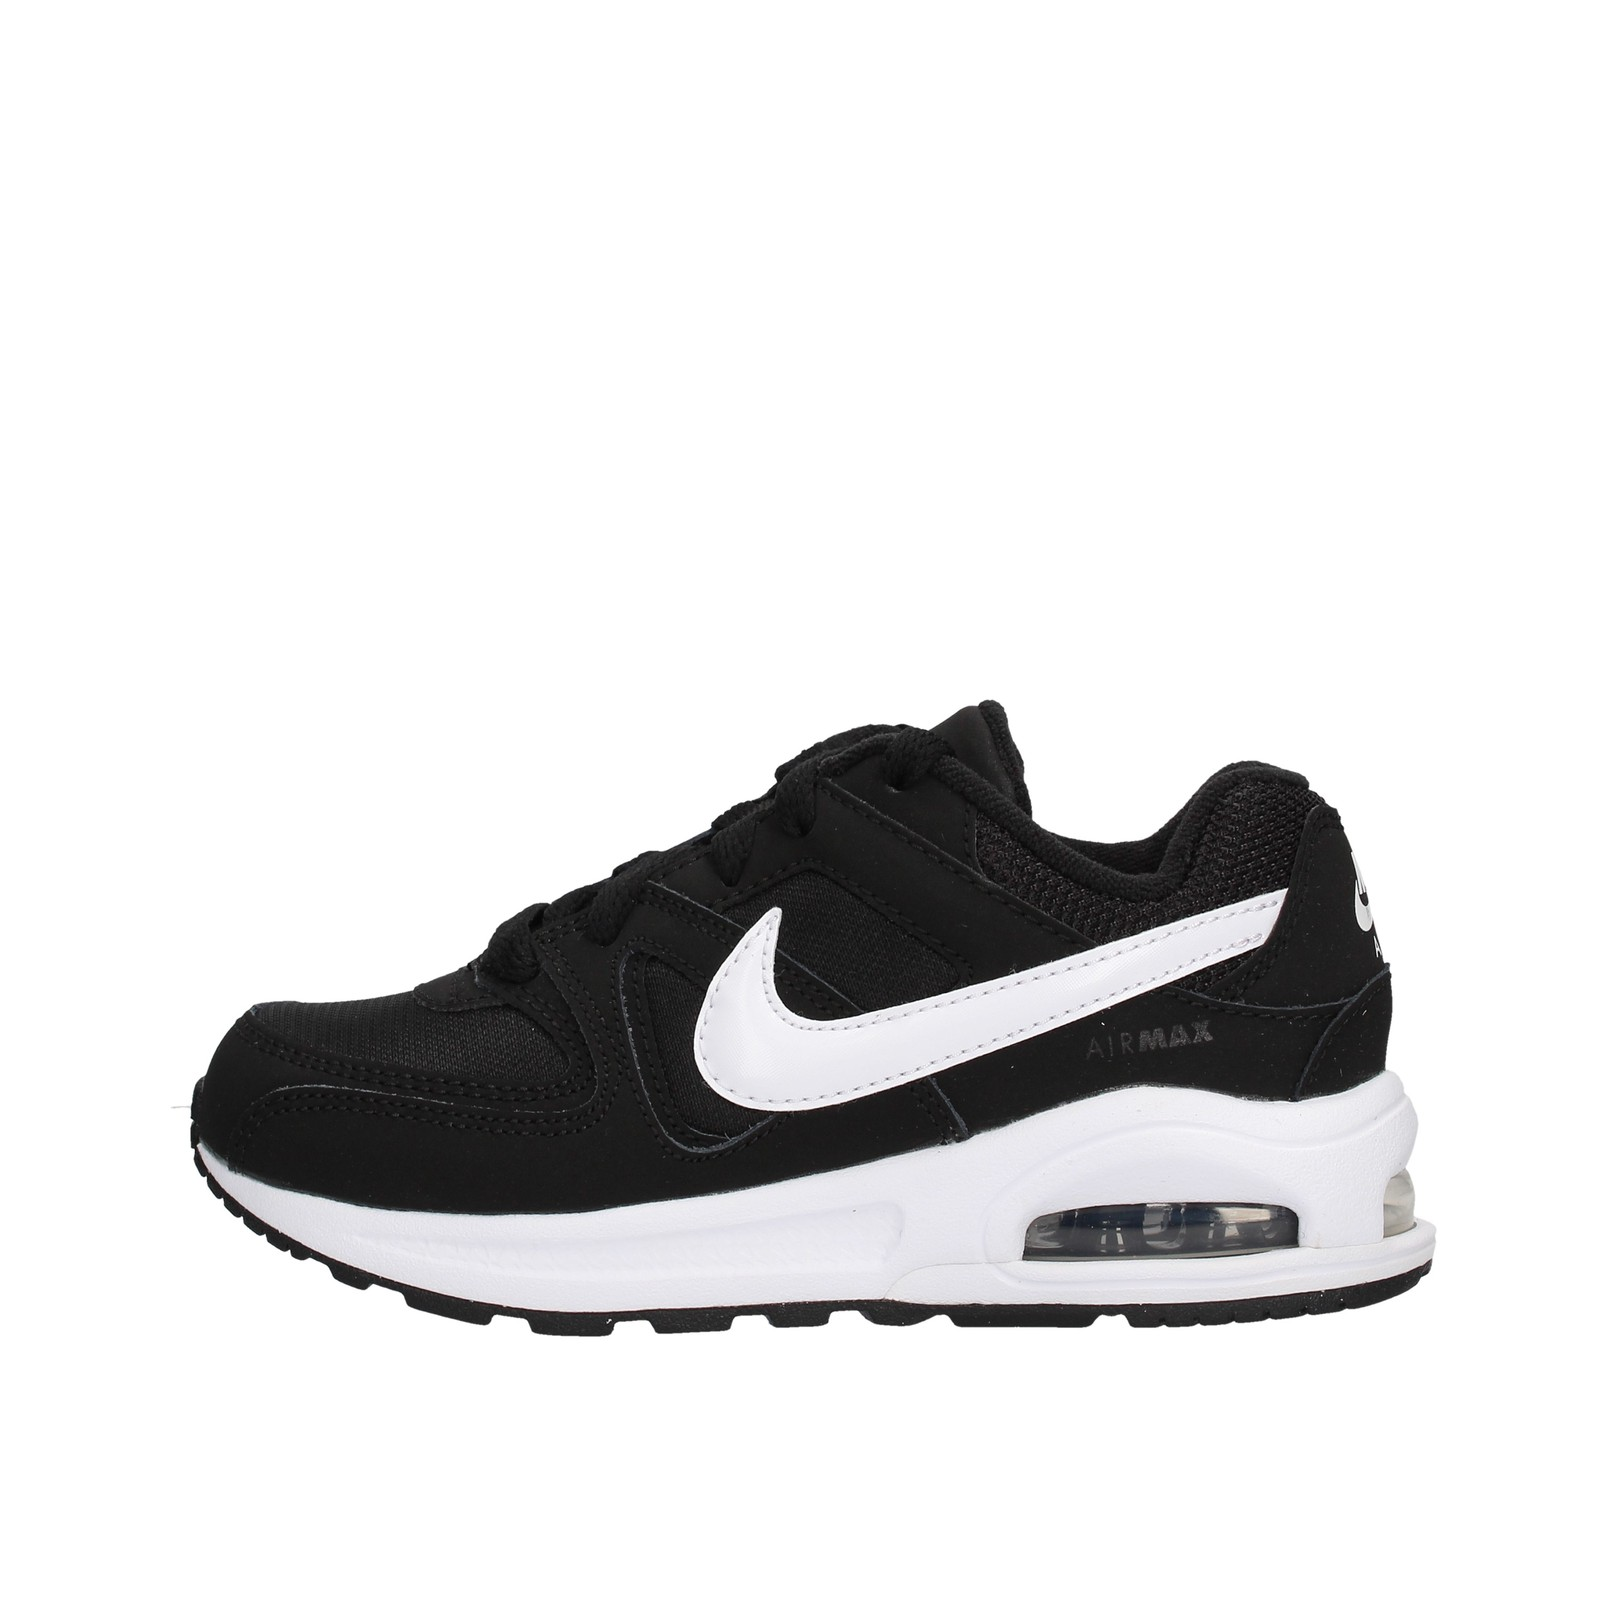 Nike - Air max command flex nero 844347-011 - $77.47